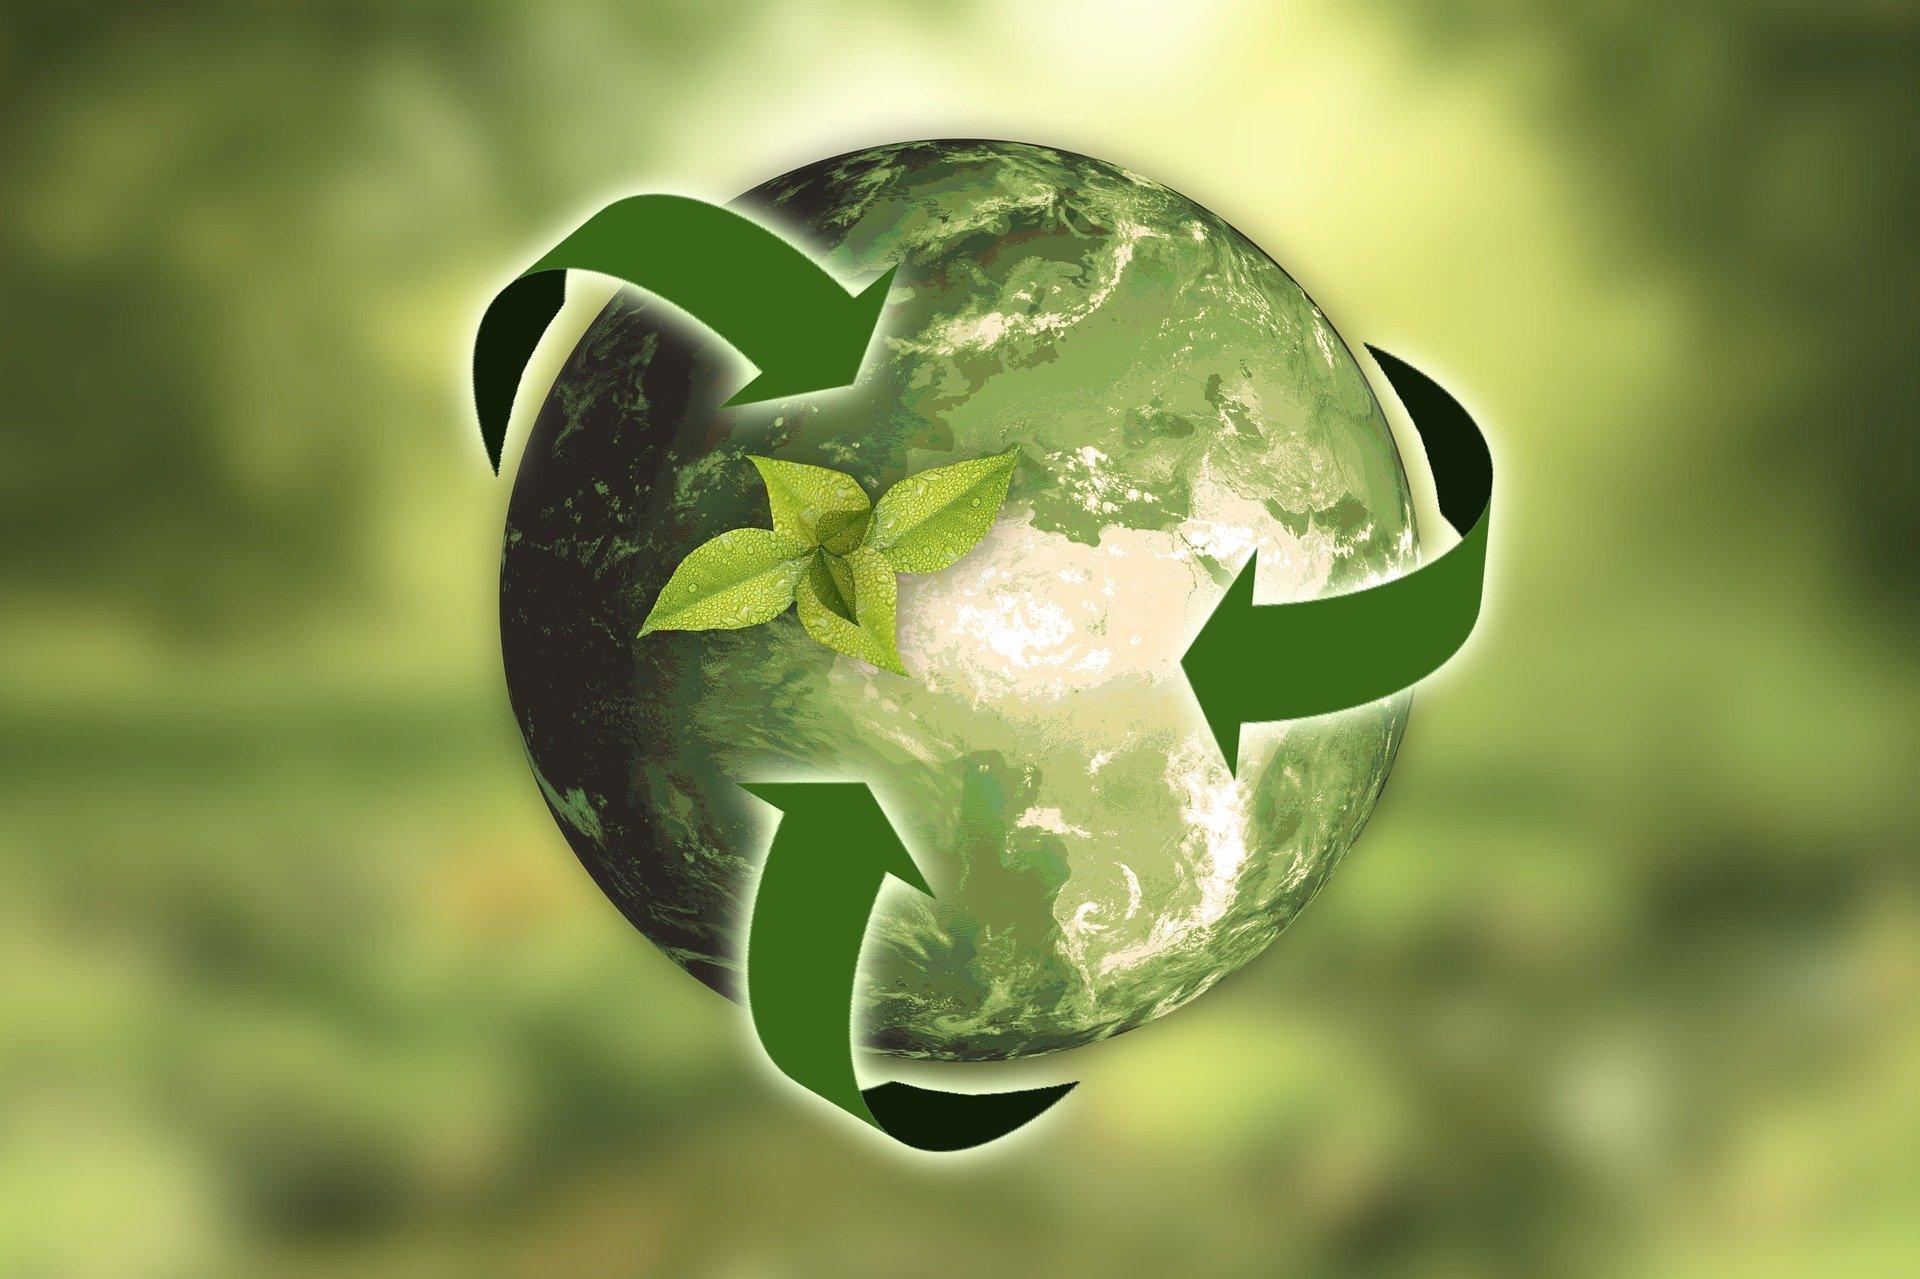 Ilustracija ekološki održive planete Zemlje (annca from Pixabay)